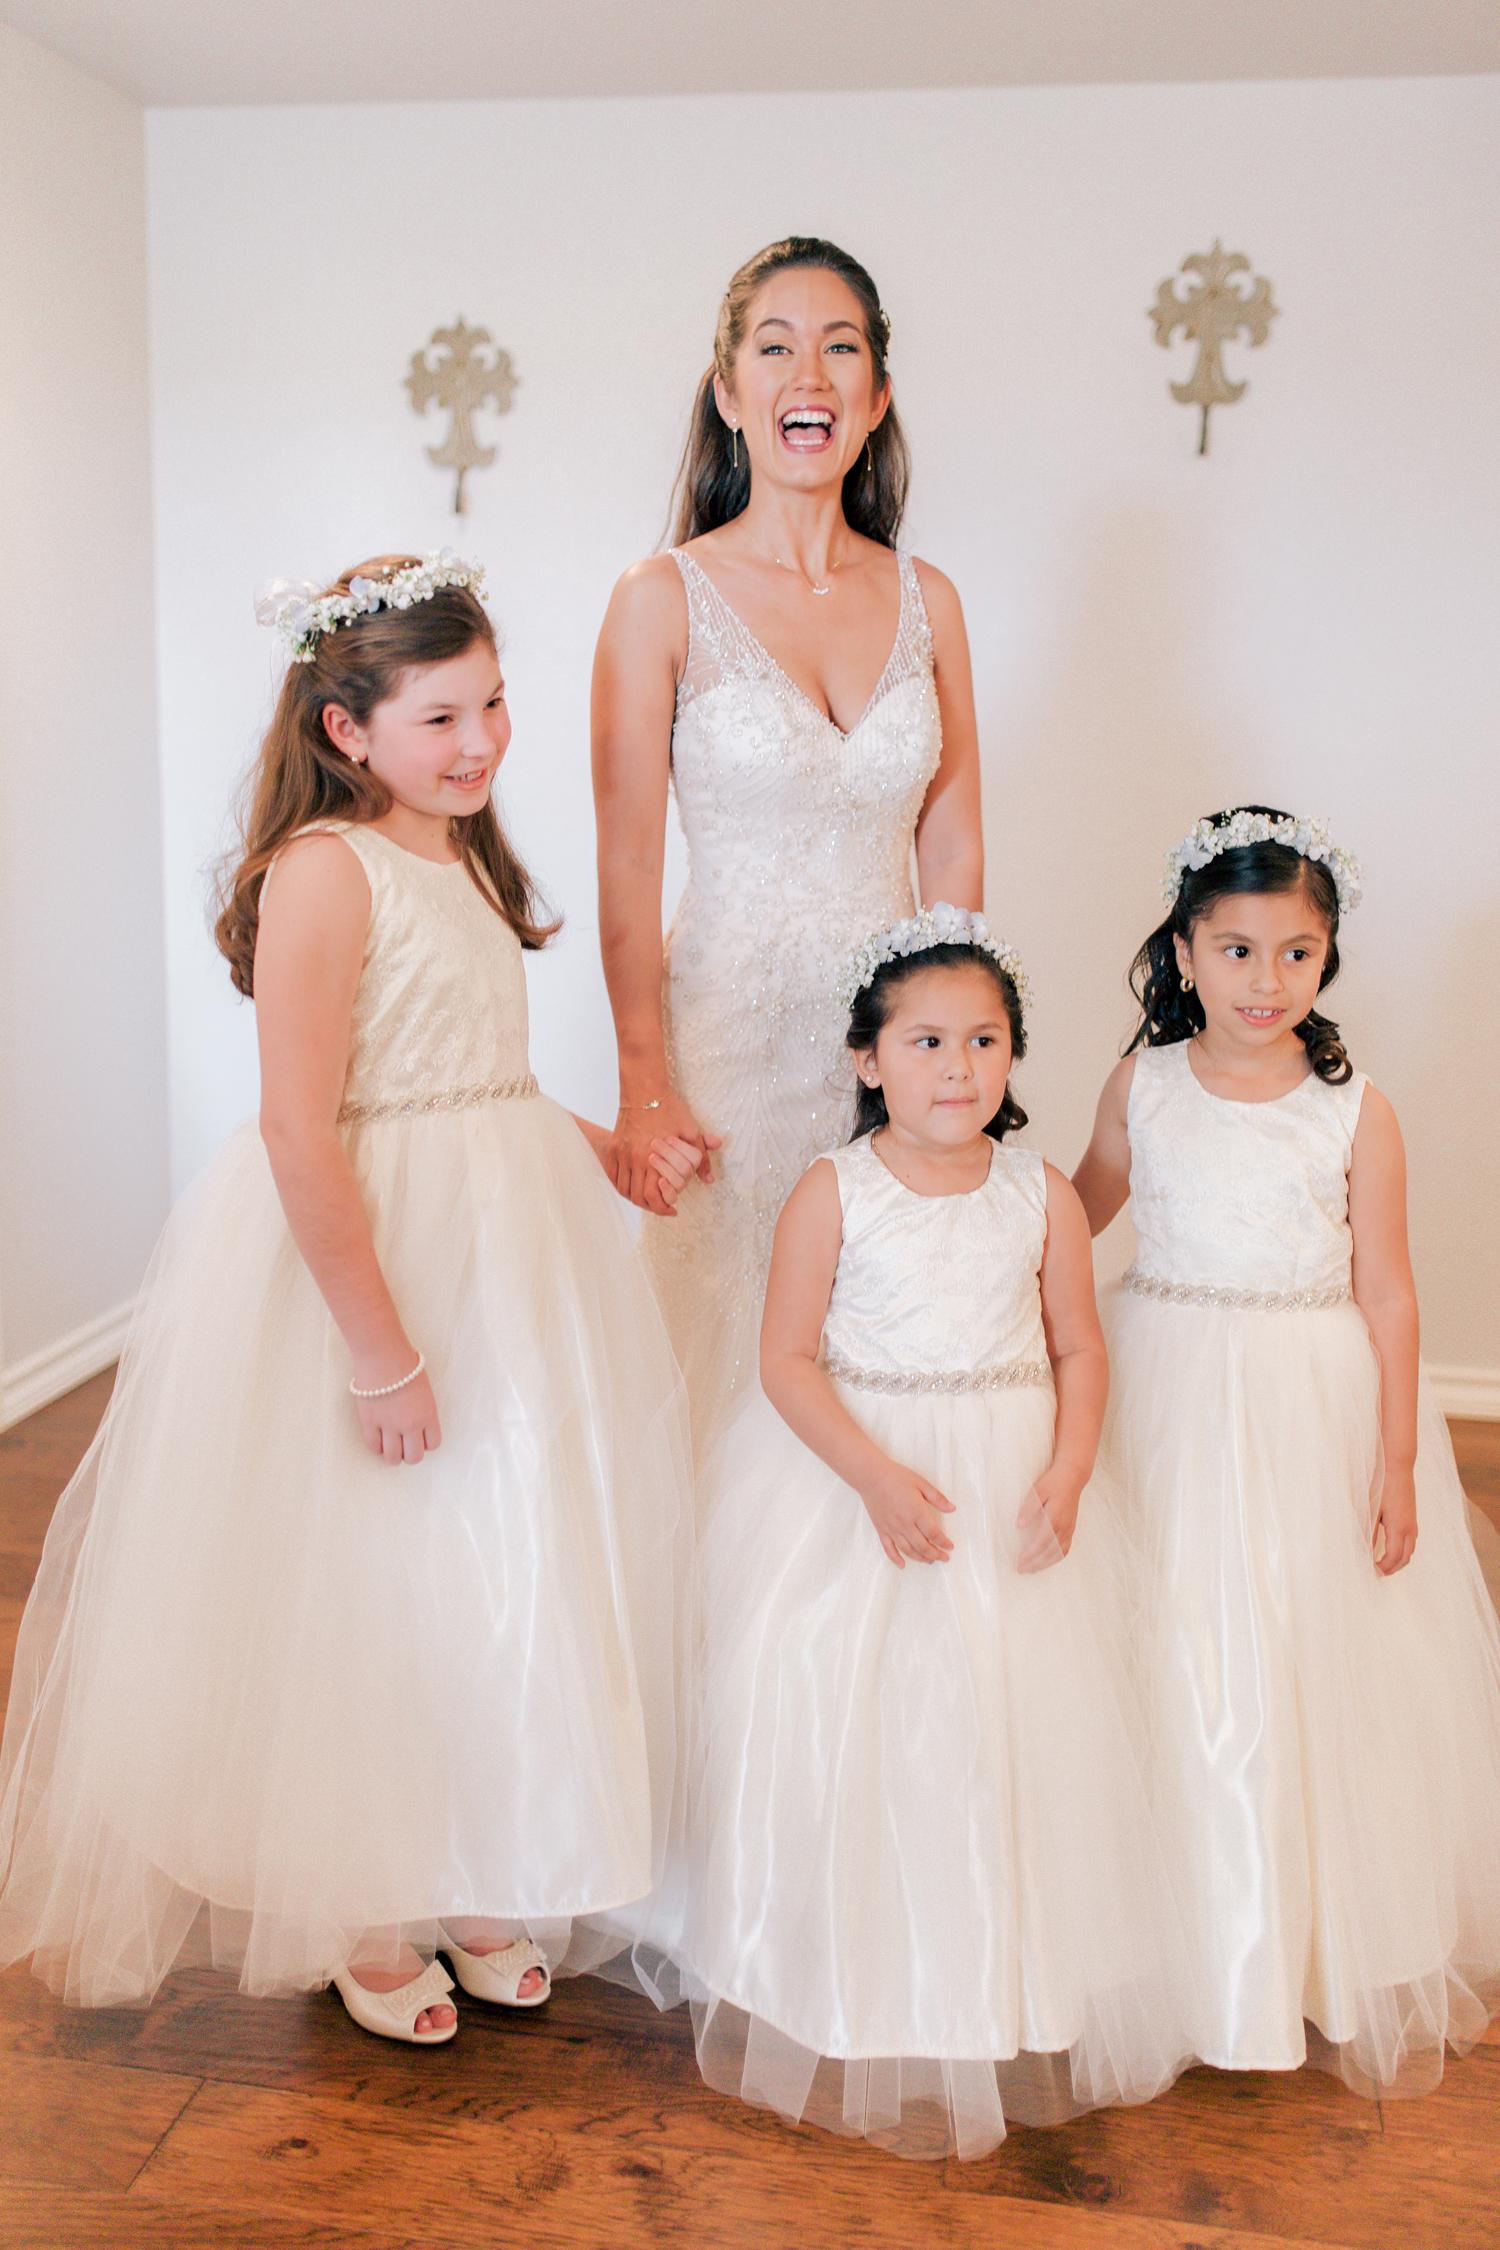 alaa-marzouk-photography-rgvweddingphotographer-rio-grande-valley-mathis-wedding-bridal-bride-san-antonio-portrait-weddings-mcallen-76.jpg